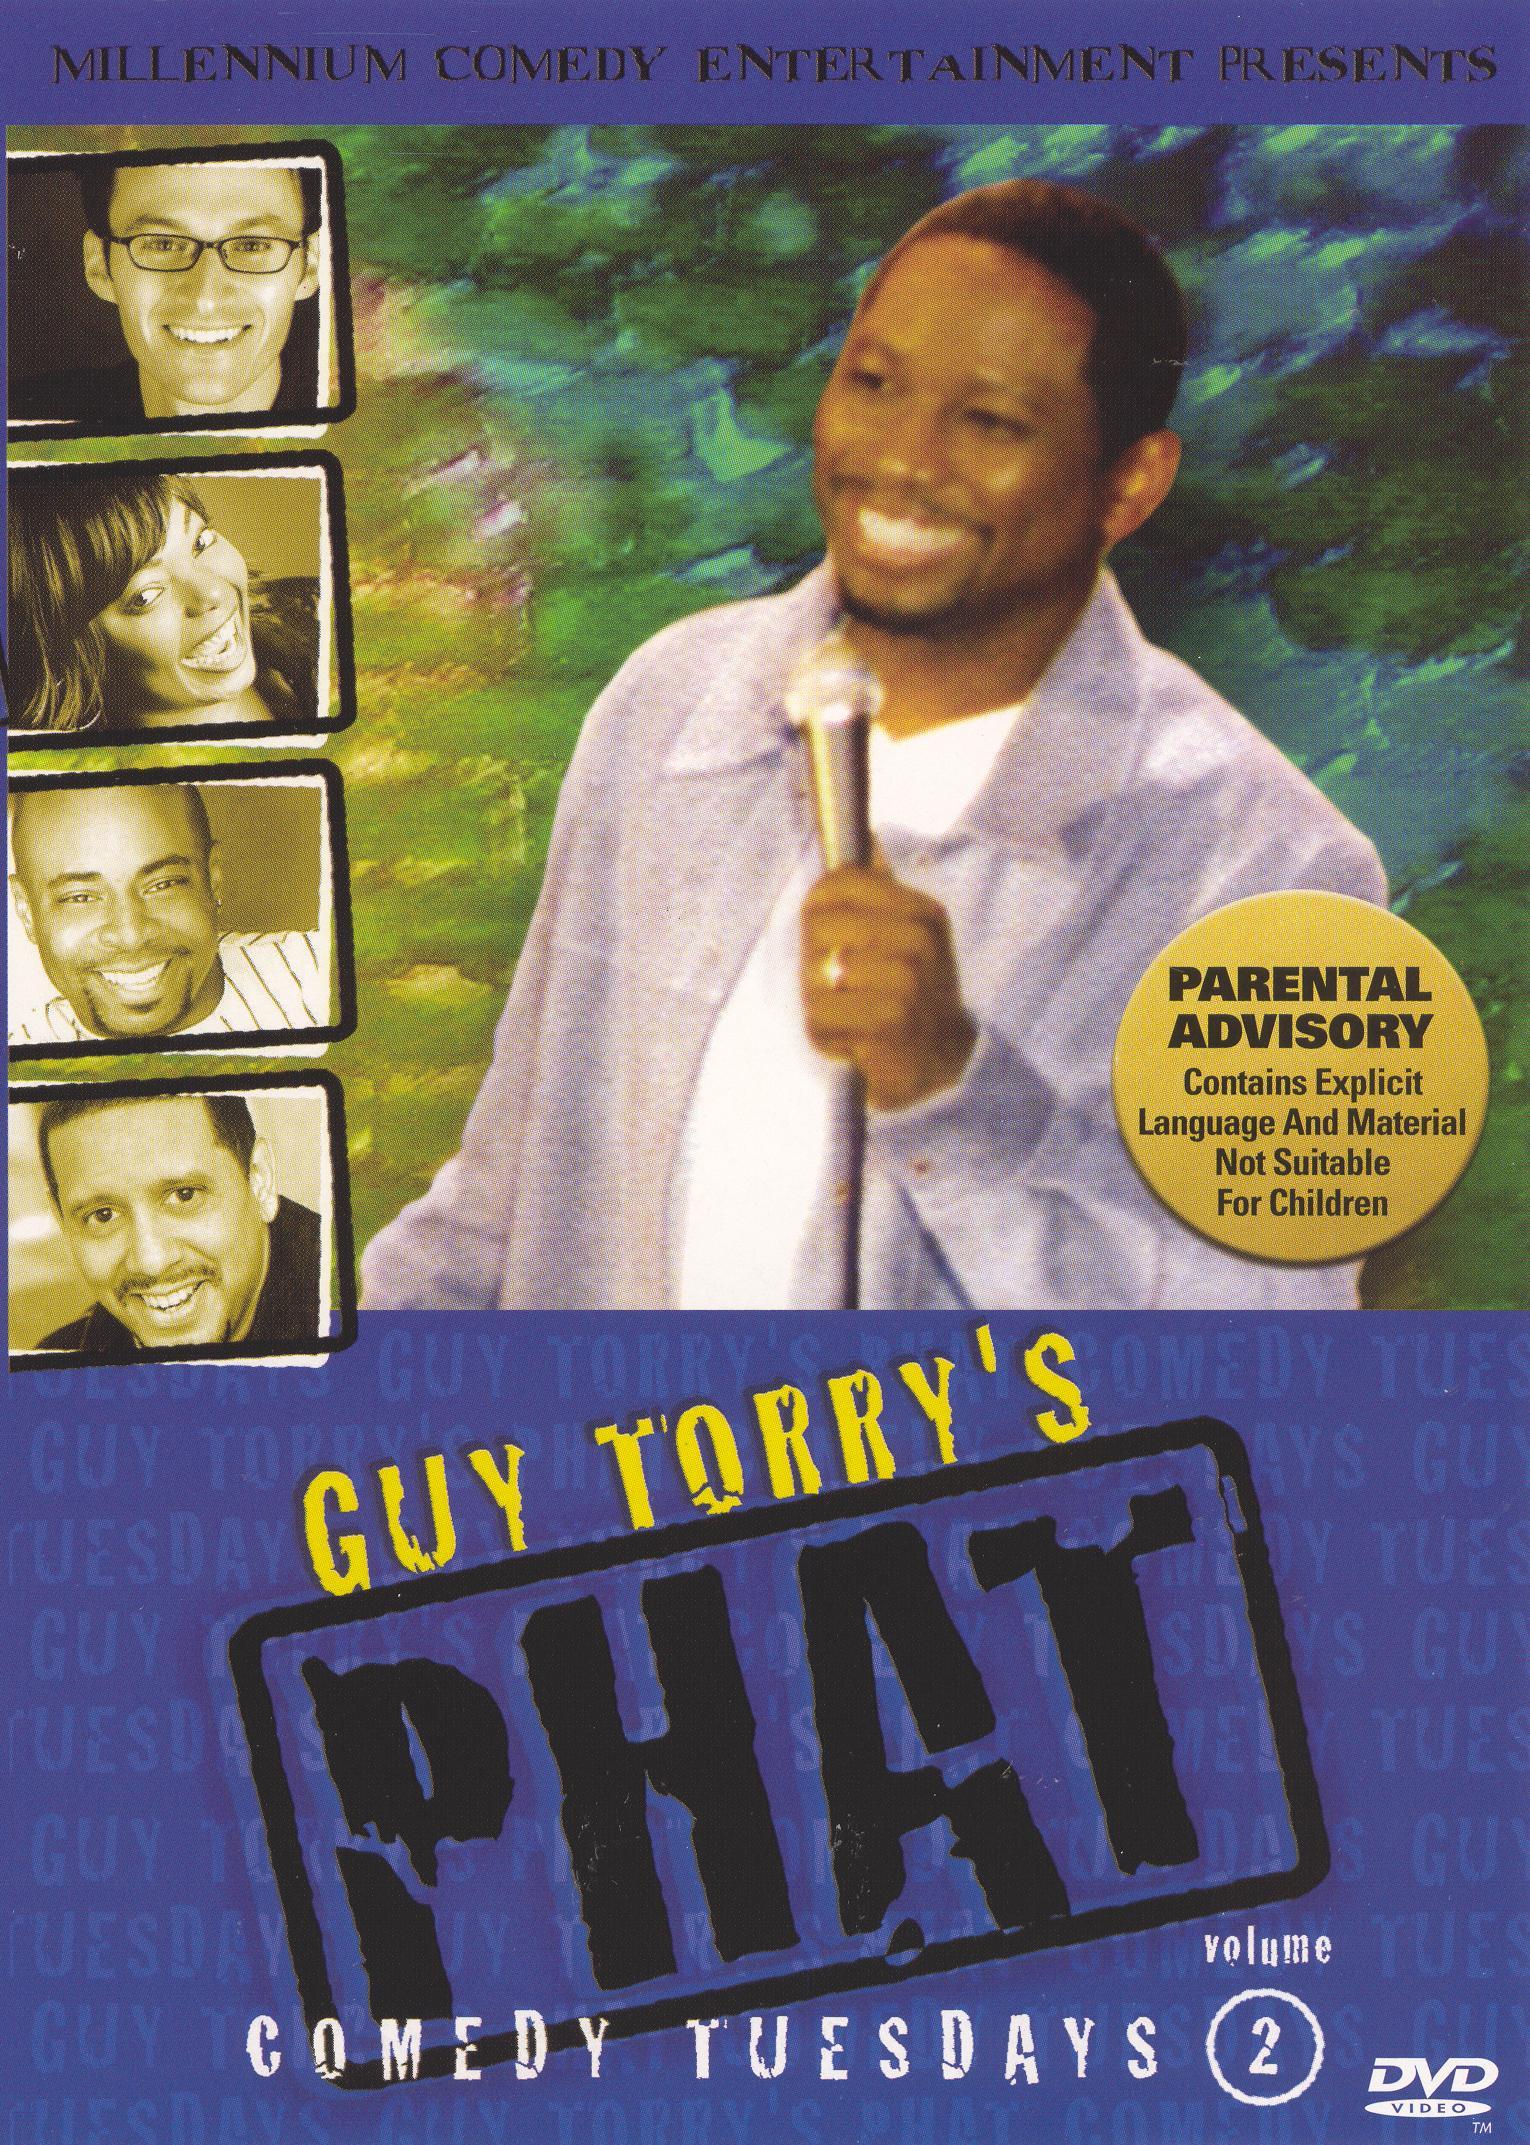 Phat Comedy Tuesdays, Vol. 2